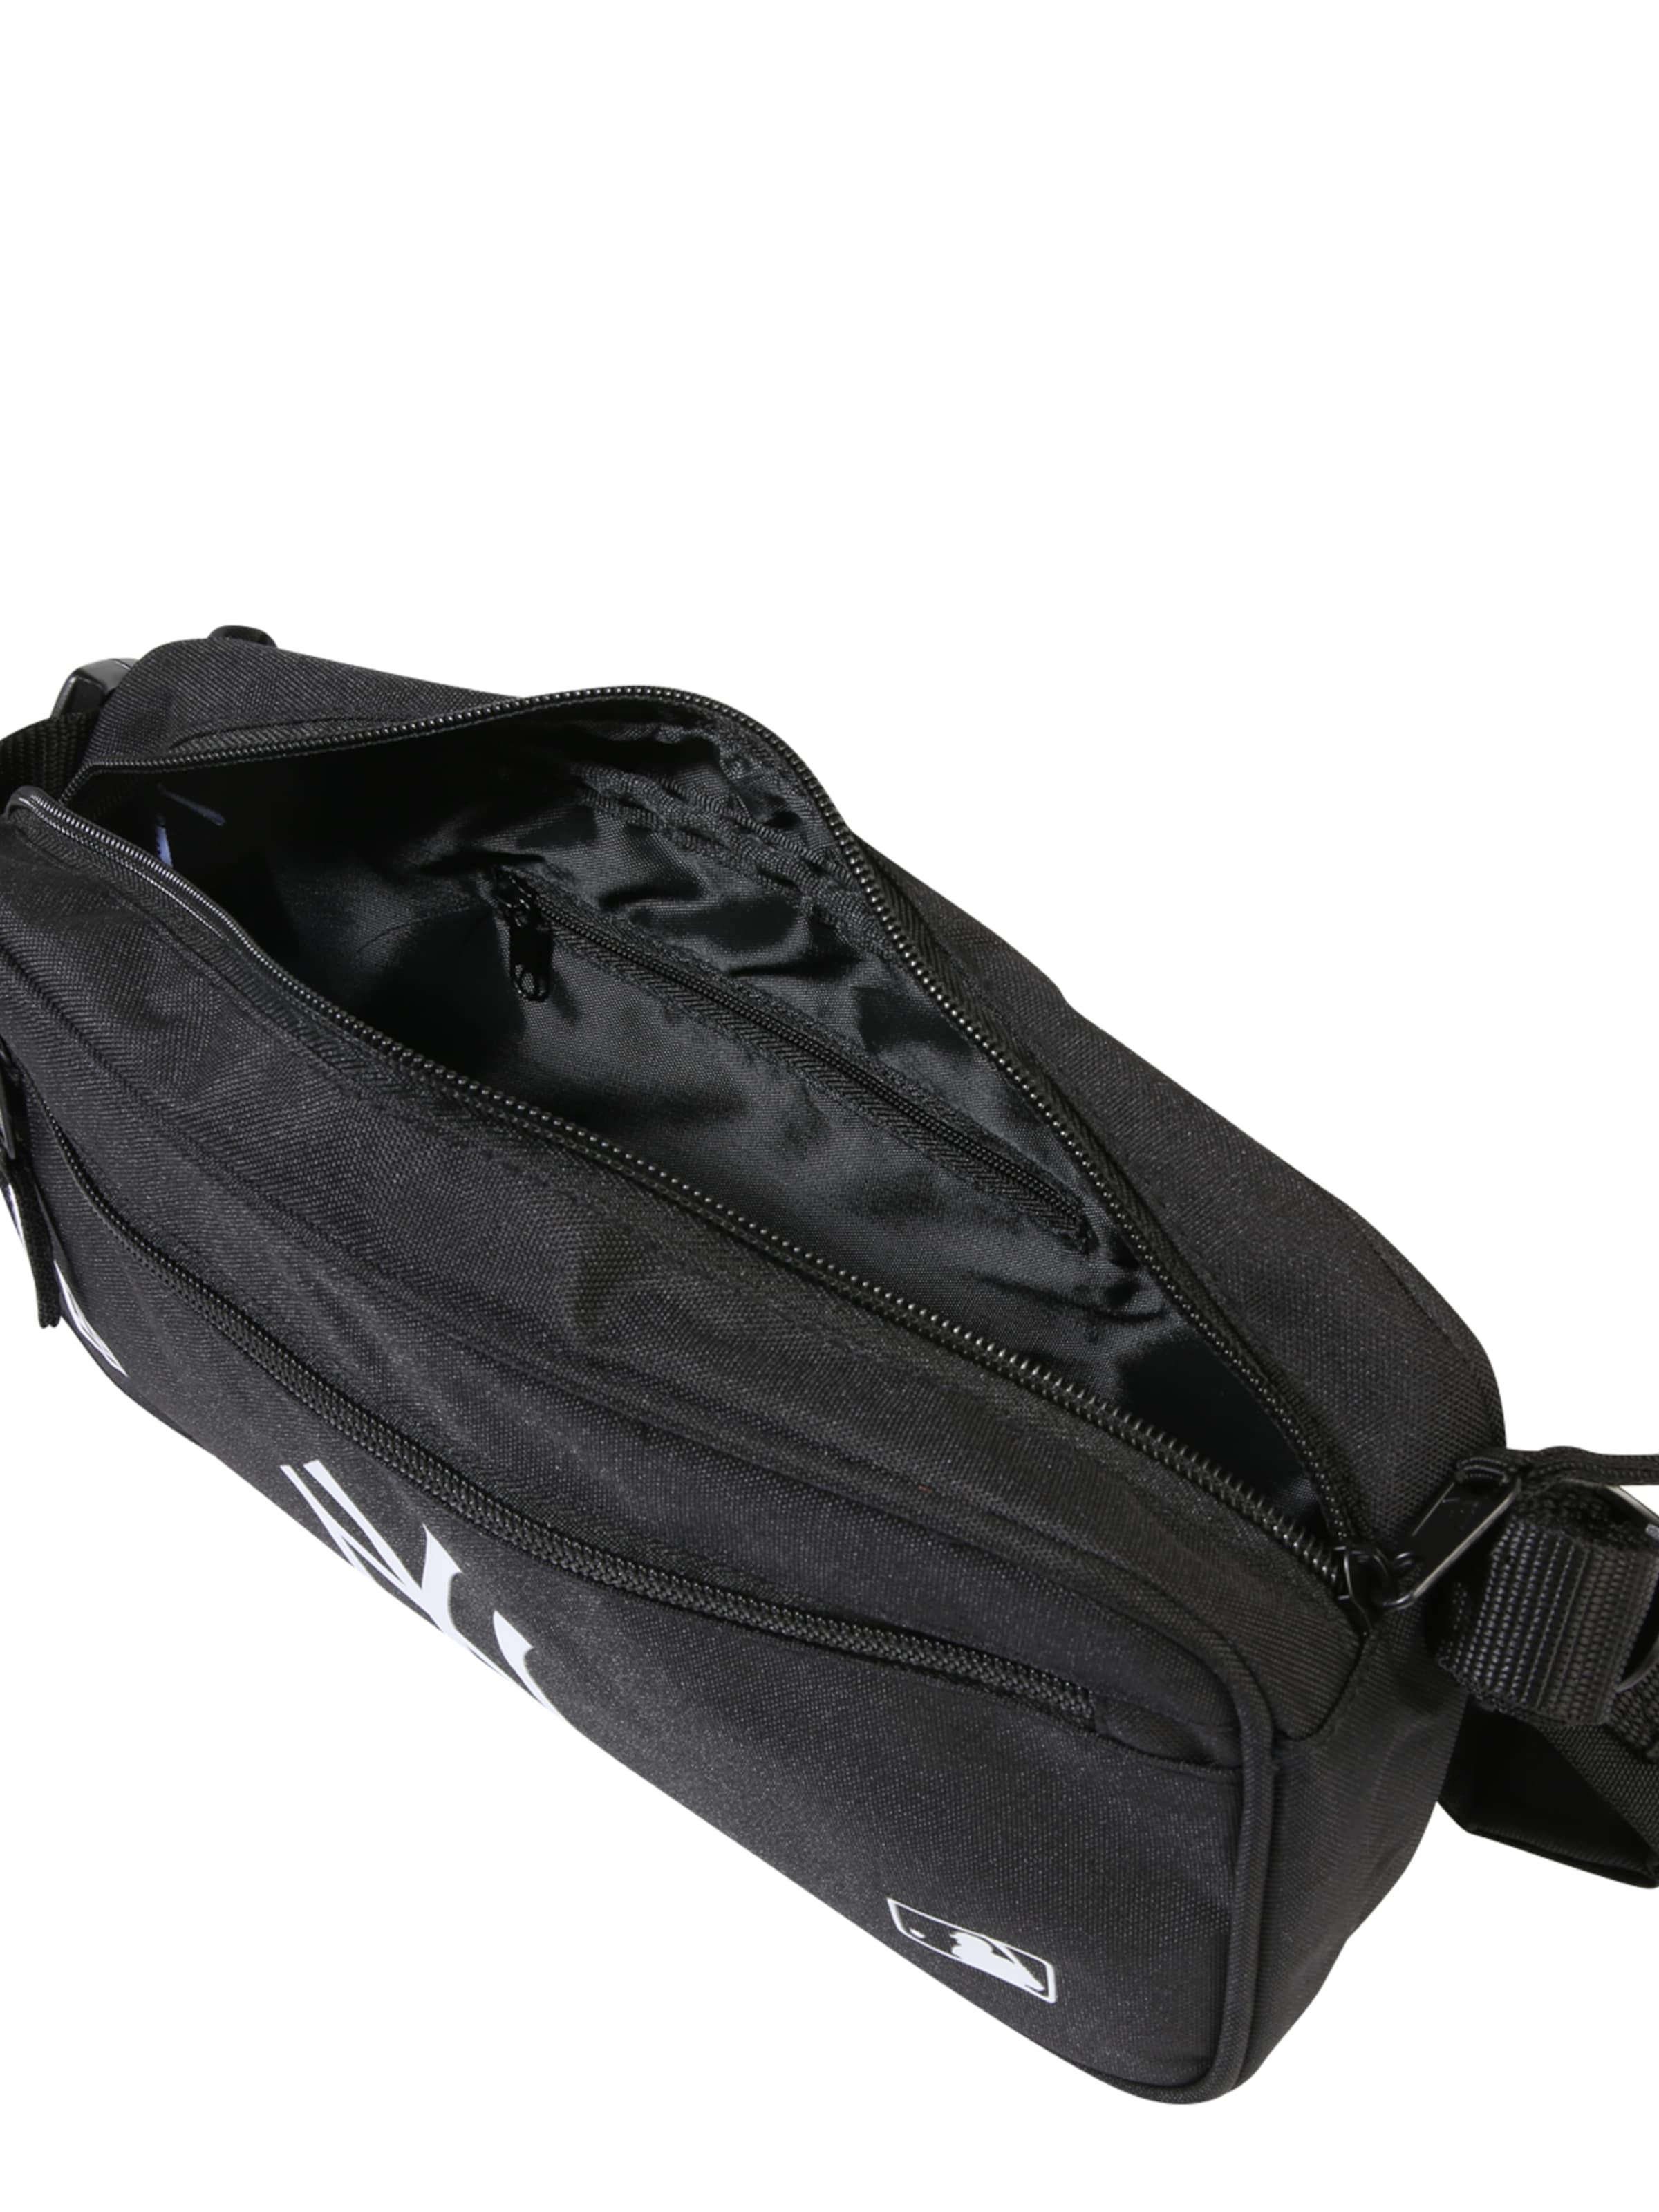 'mlb Noir En Era Bag' New Sacs Banane Body PnOkX8w0